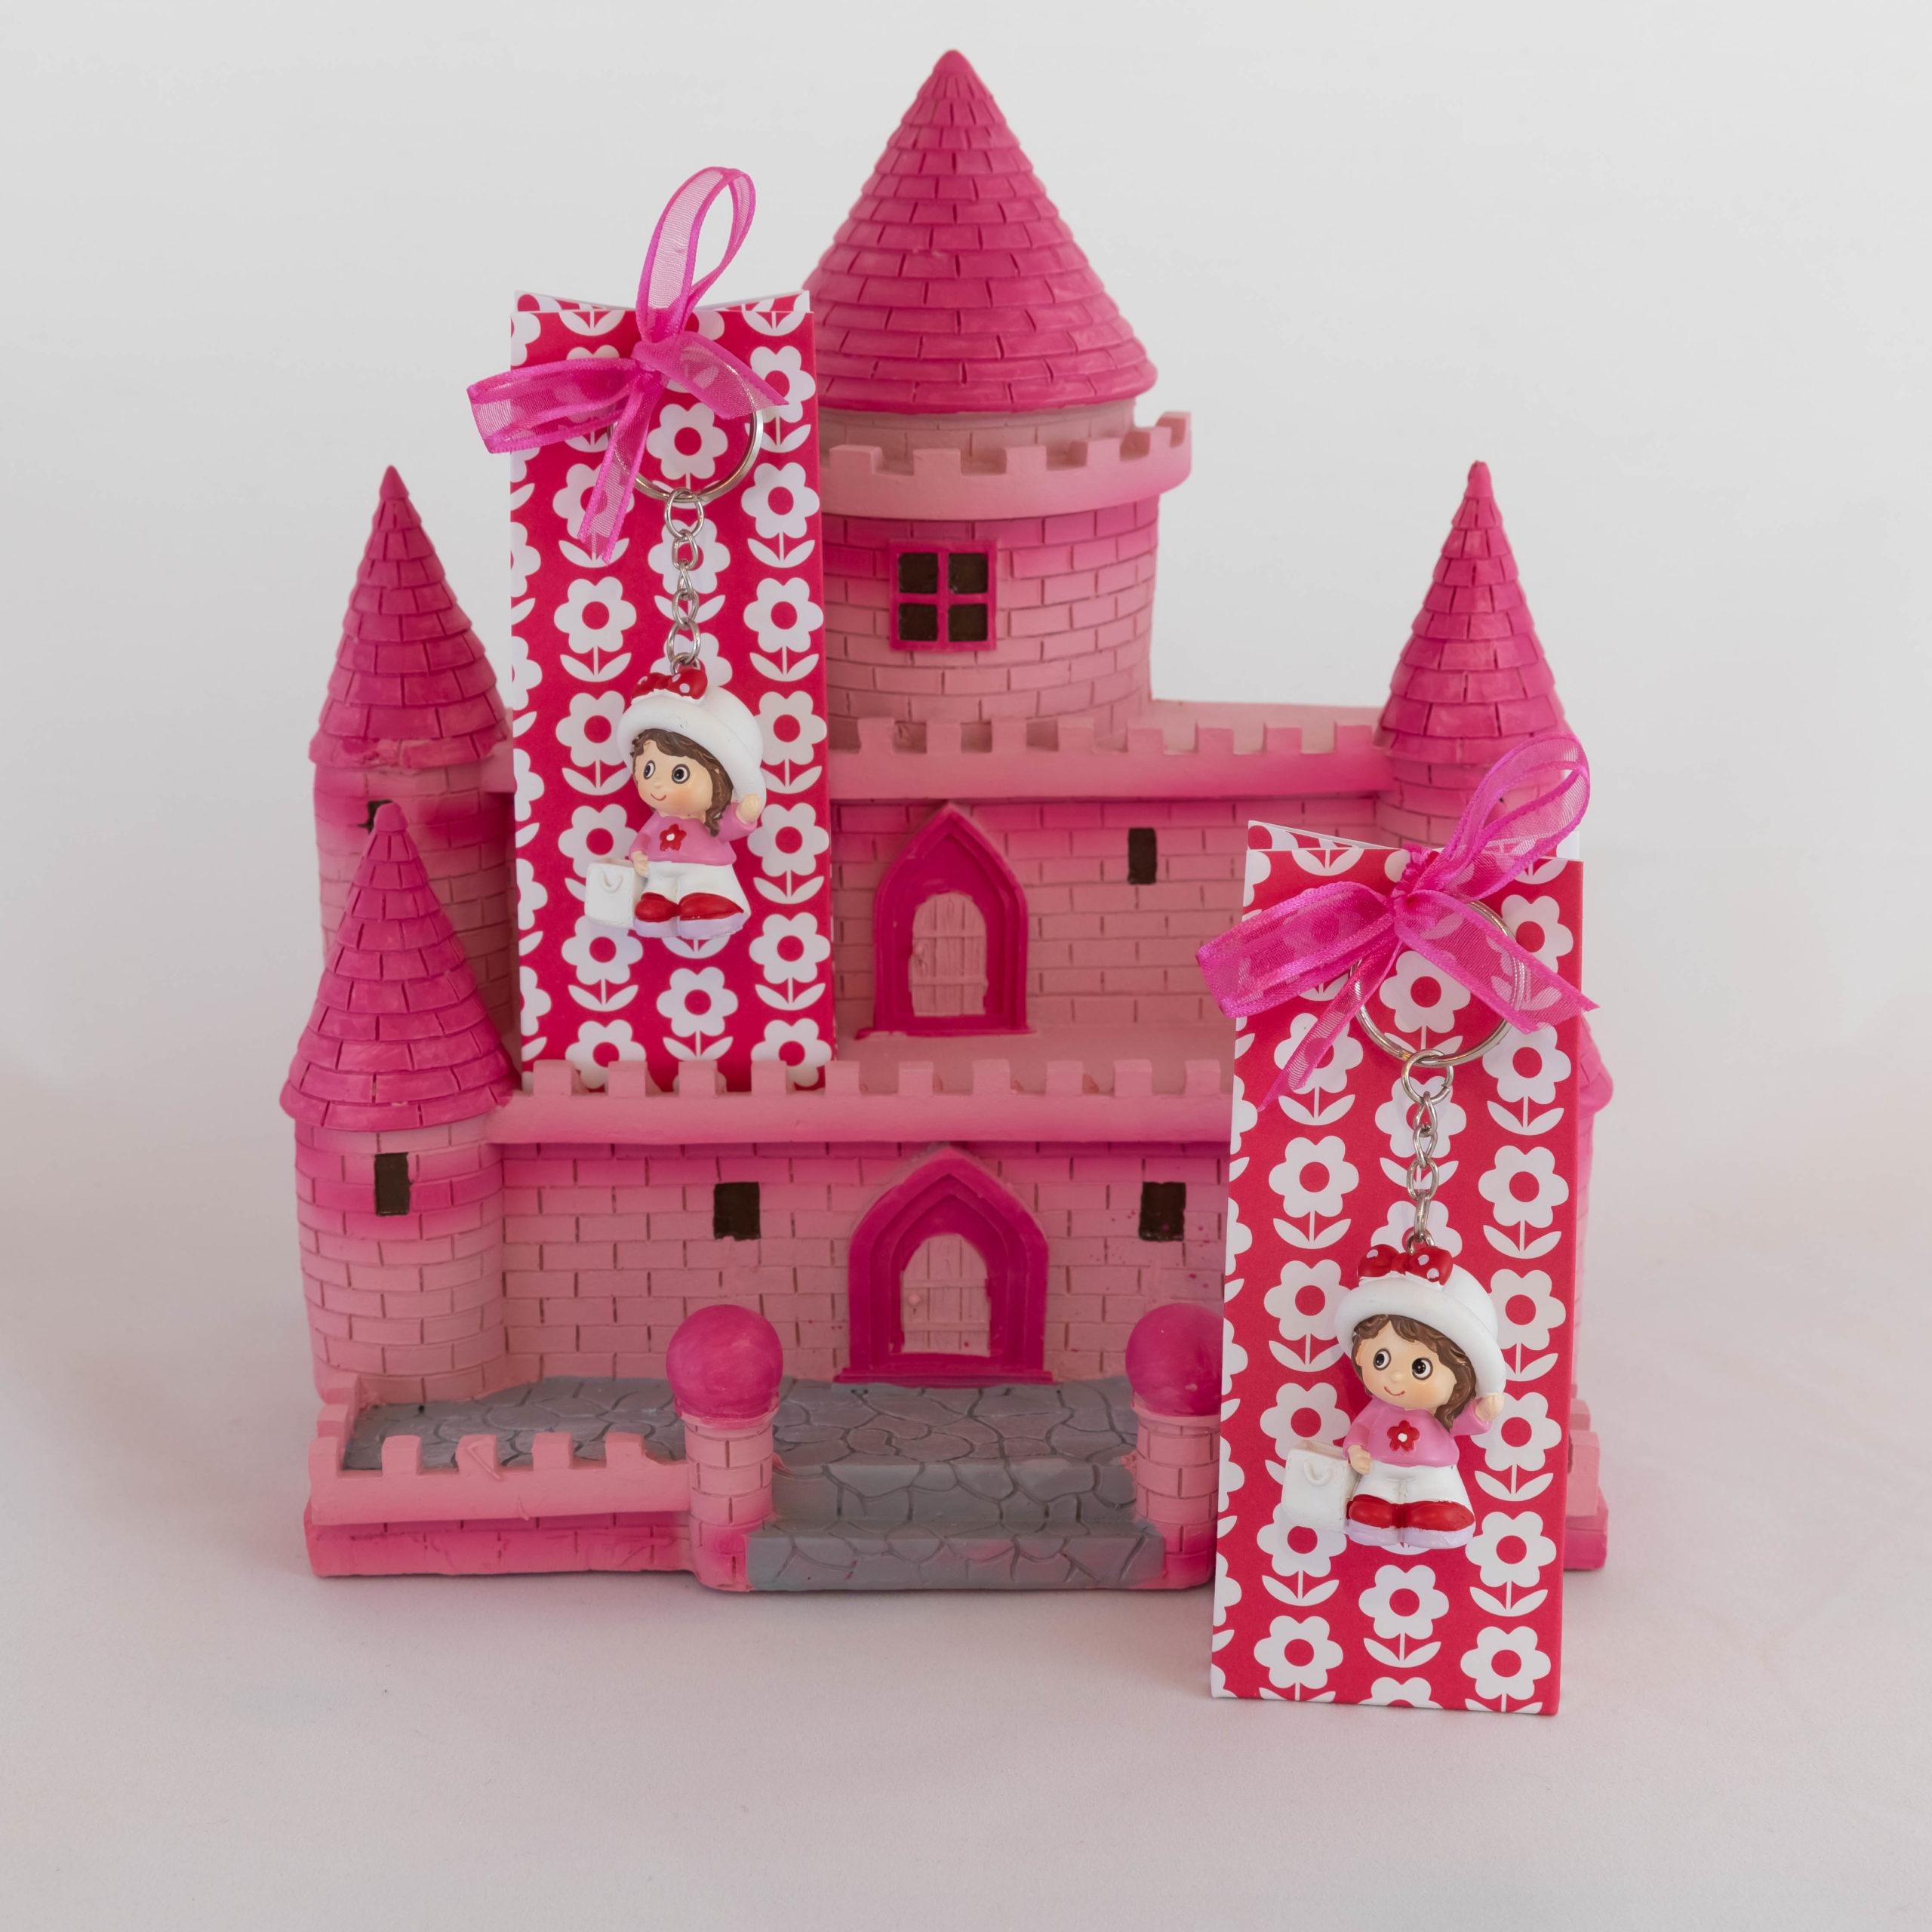 Boite porte-clé 2 - Fille rose Image